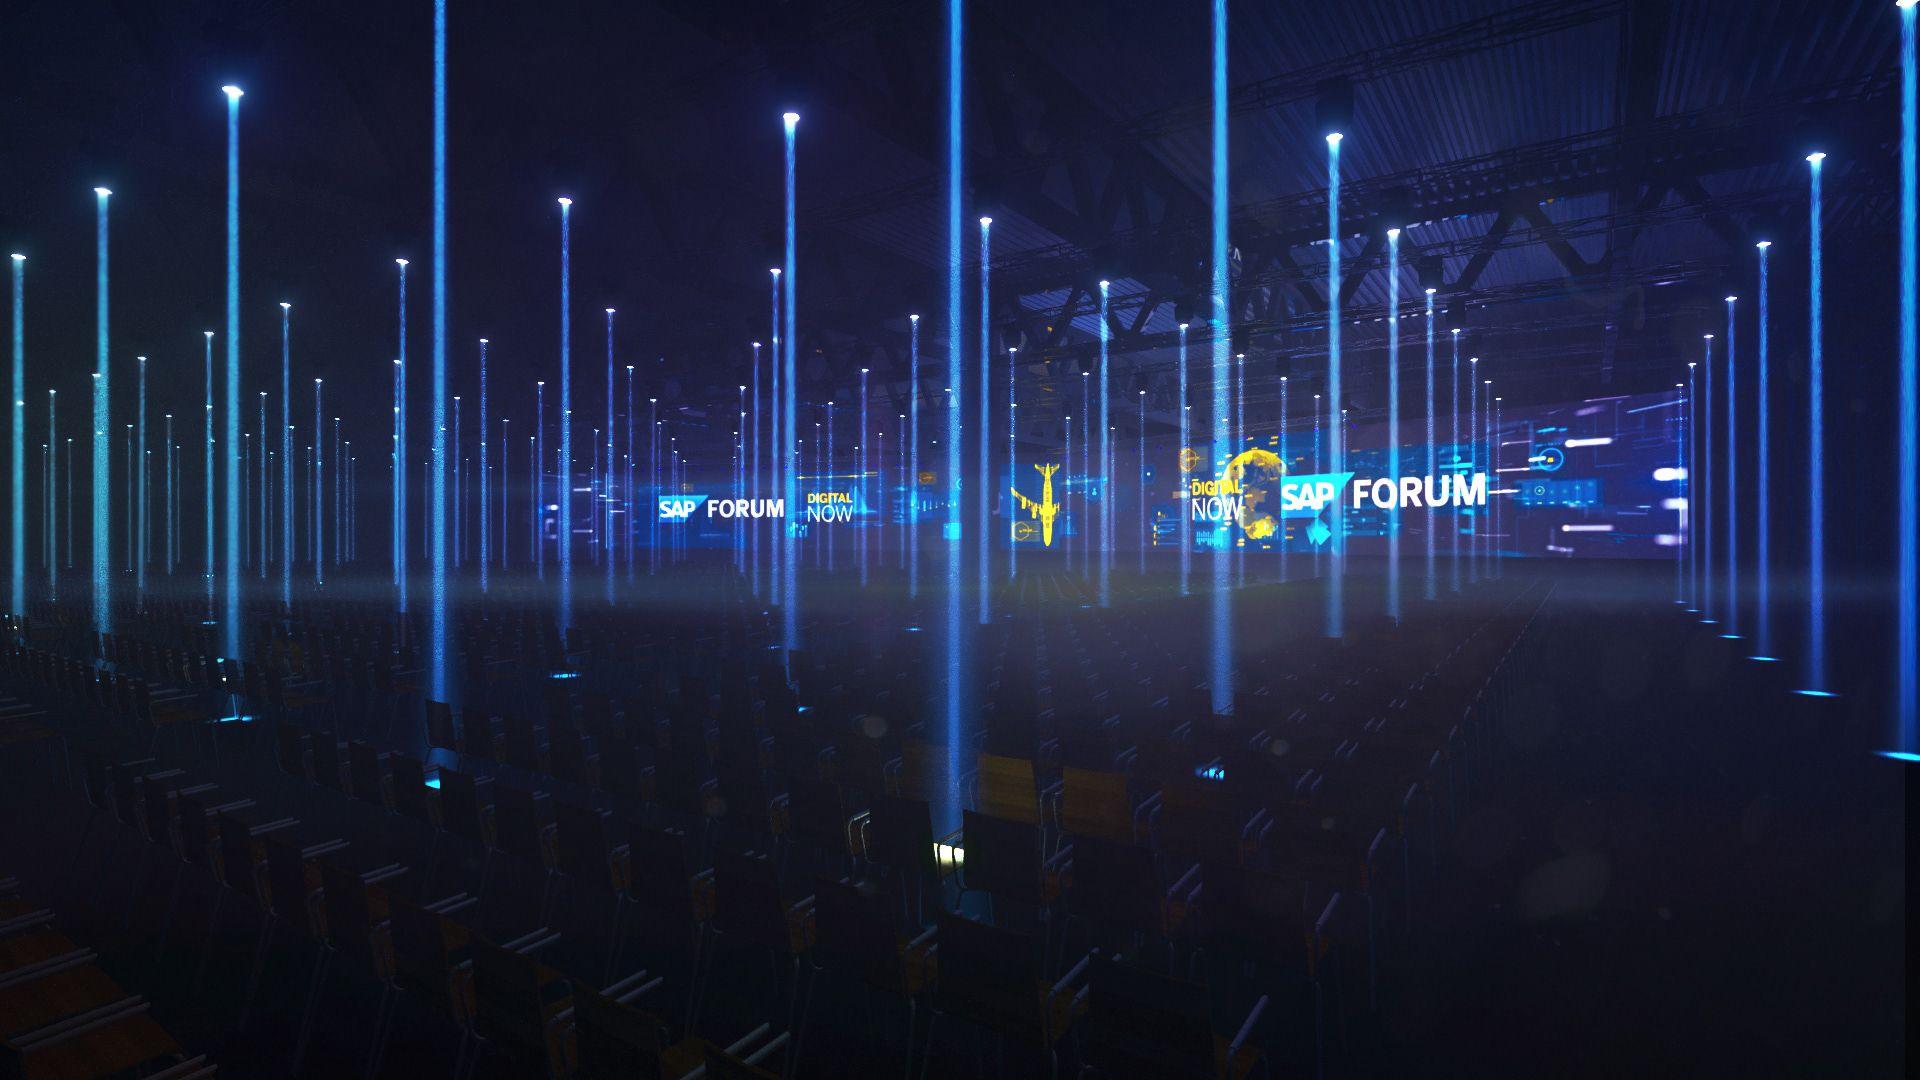 SAP Forum 2017 on Behance | event